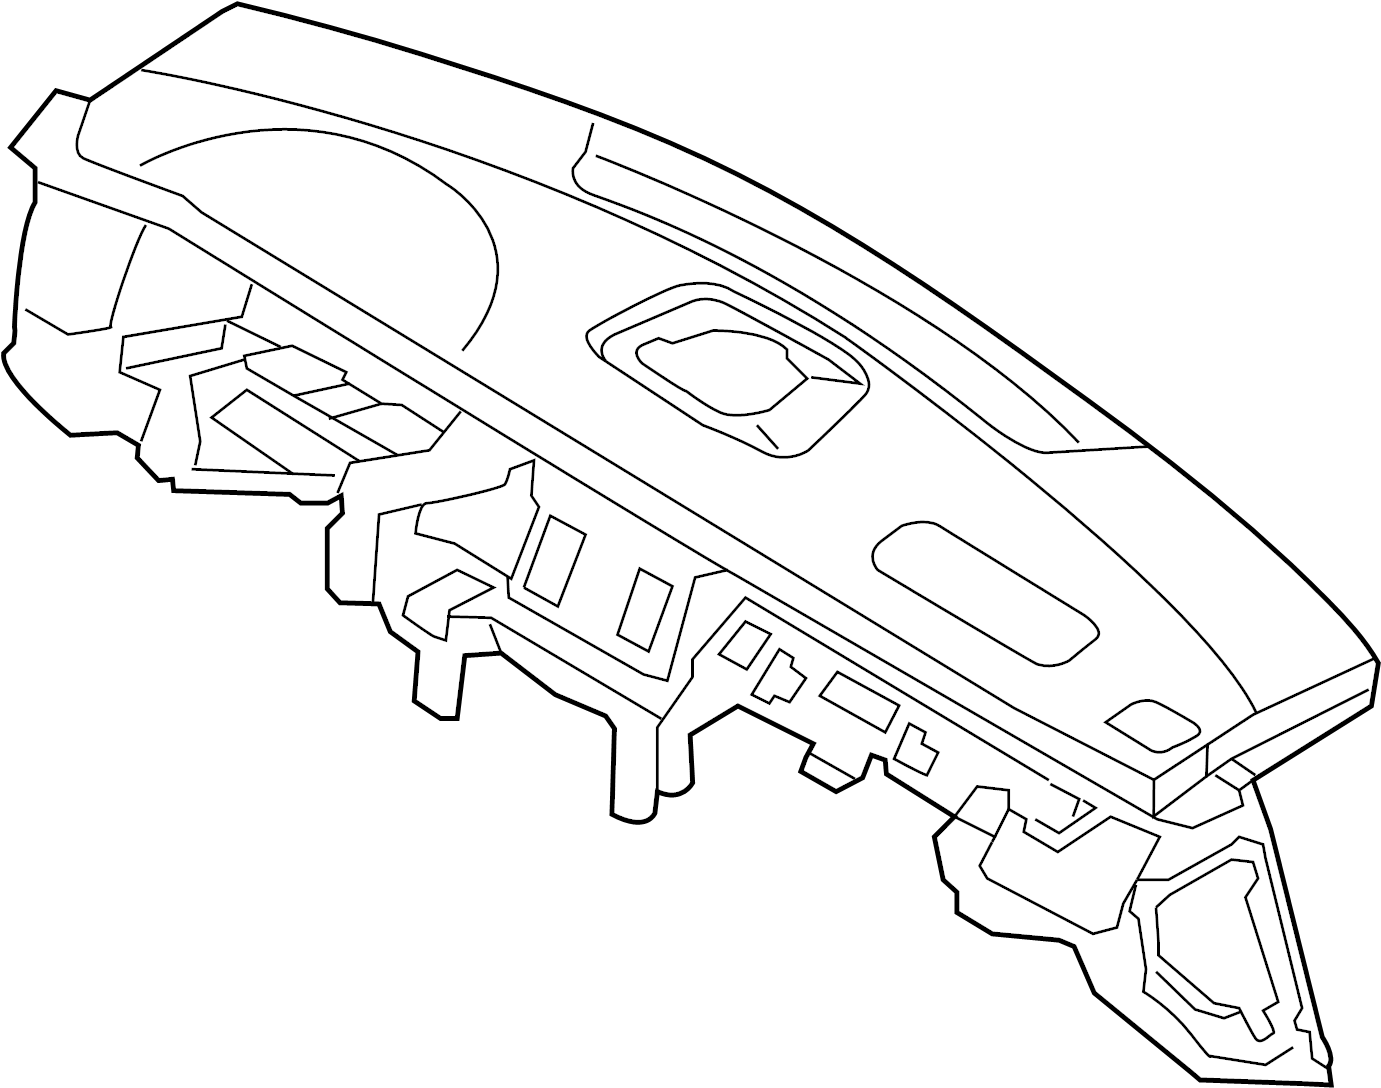 2007 acura rdx fuse box